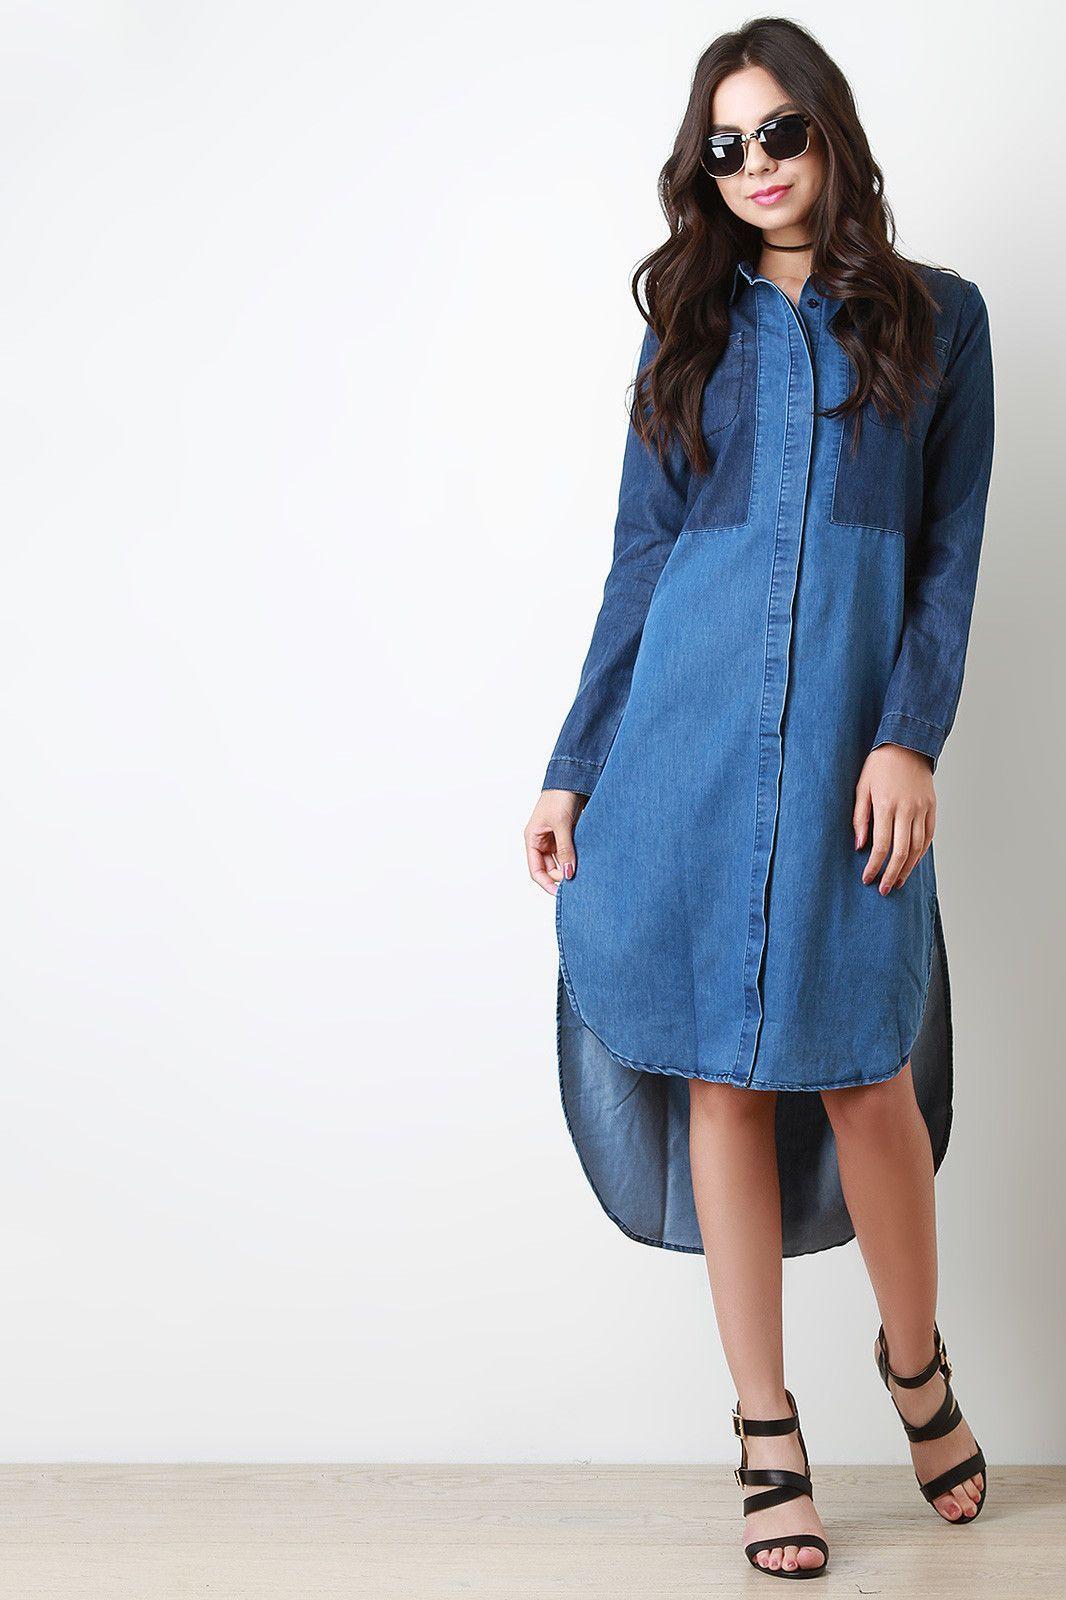 8eb71051495 Denim Colorblock Button Up Pocketed Shirt Dress